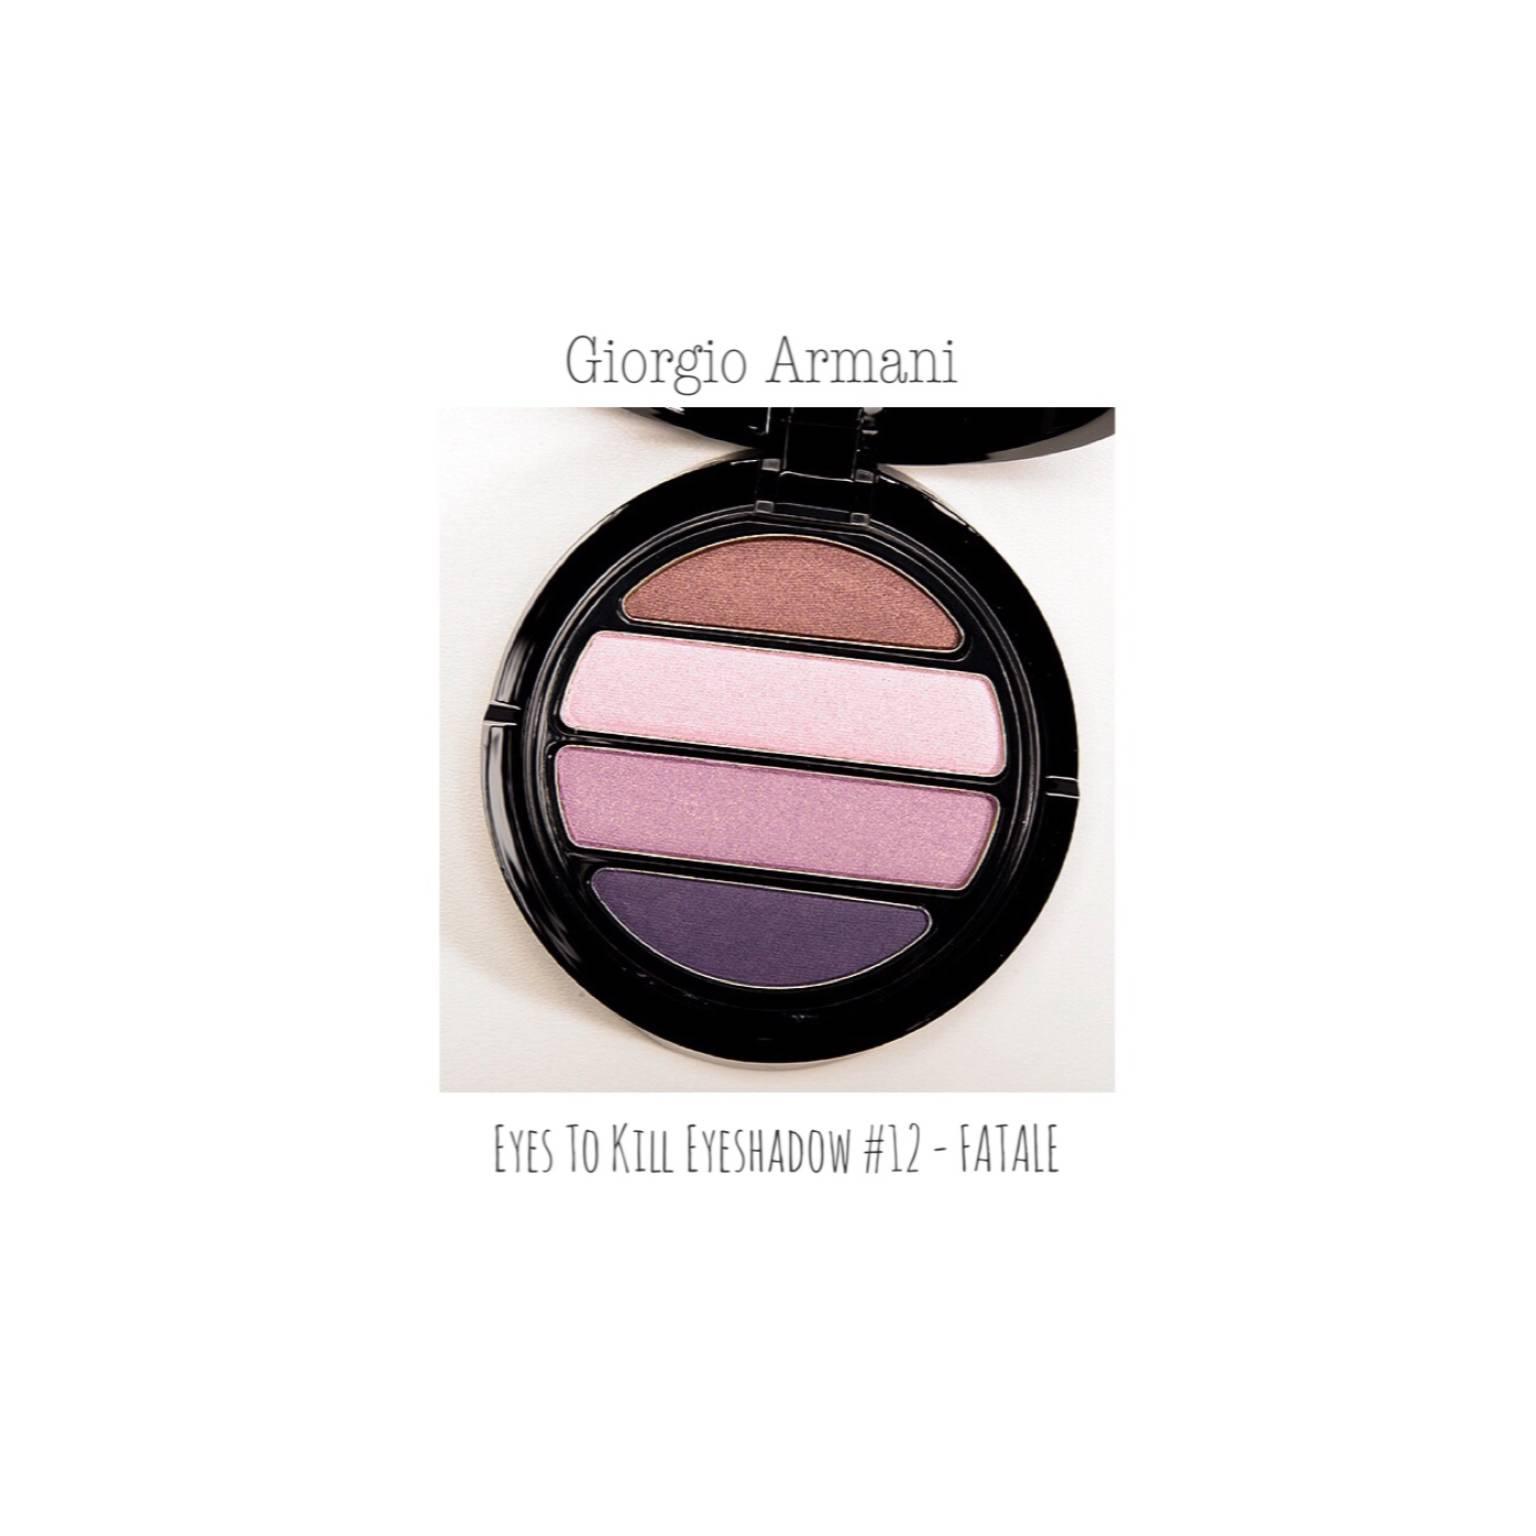 Giorgio Armani eyes to kill eyeshadow quad shade 12 - FATALE